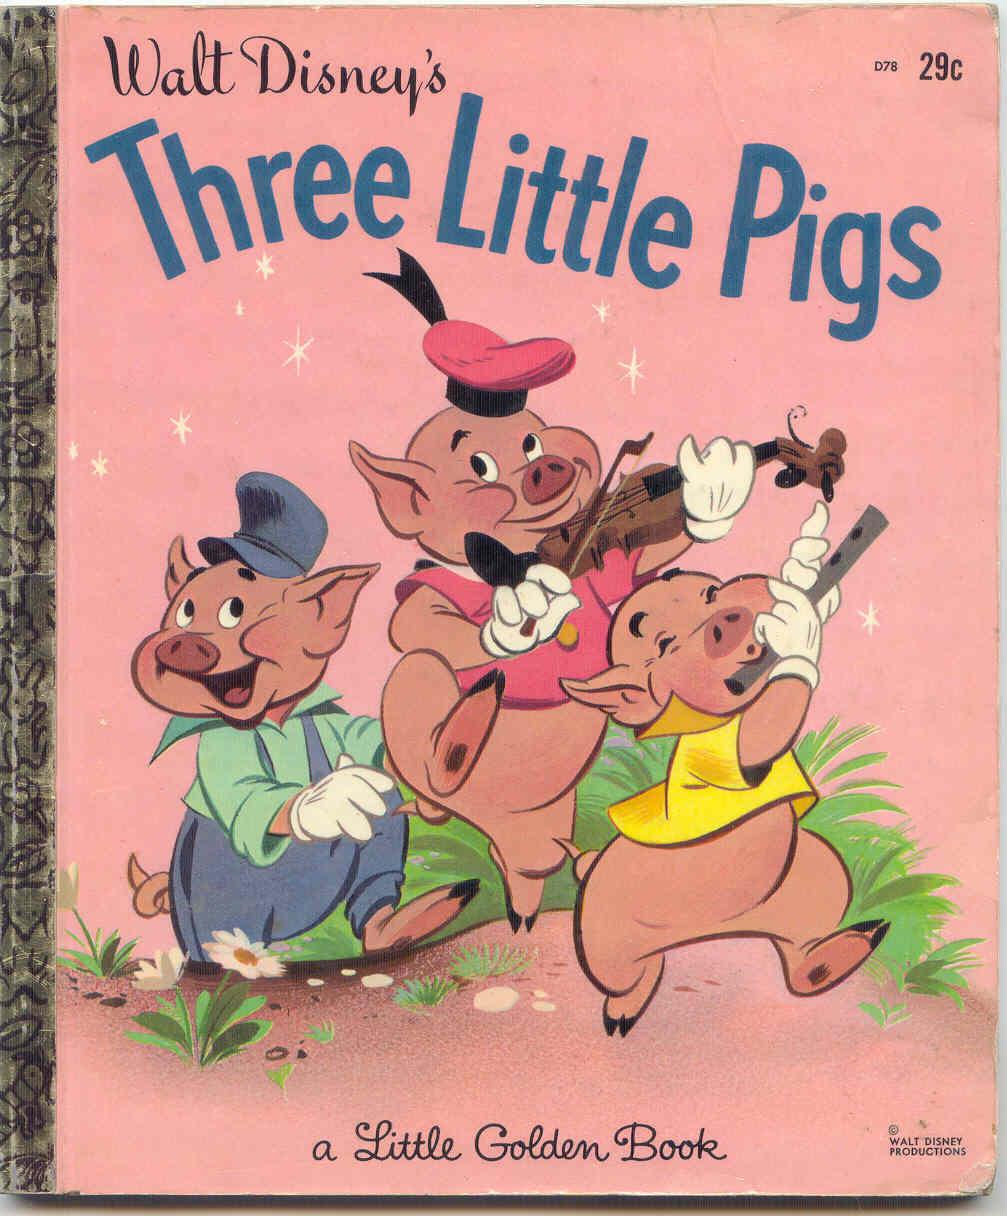 Does three little pigs send a dangerous message